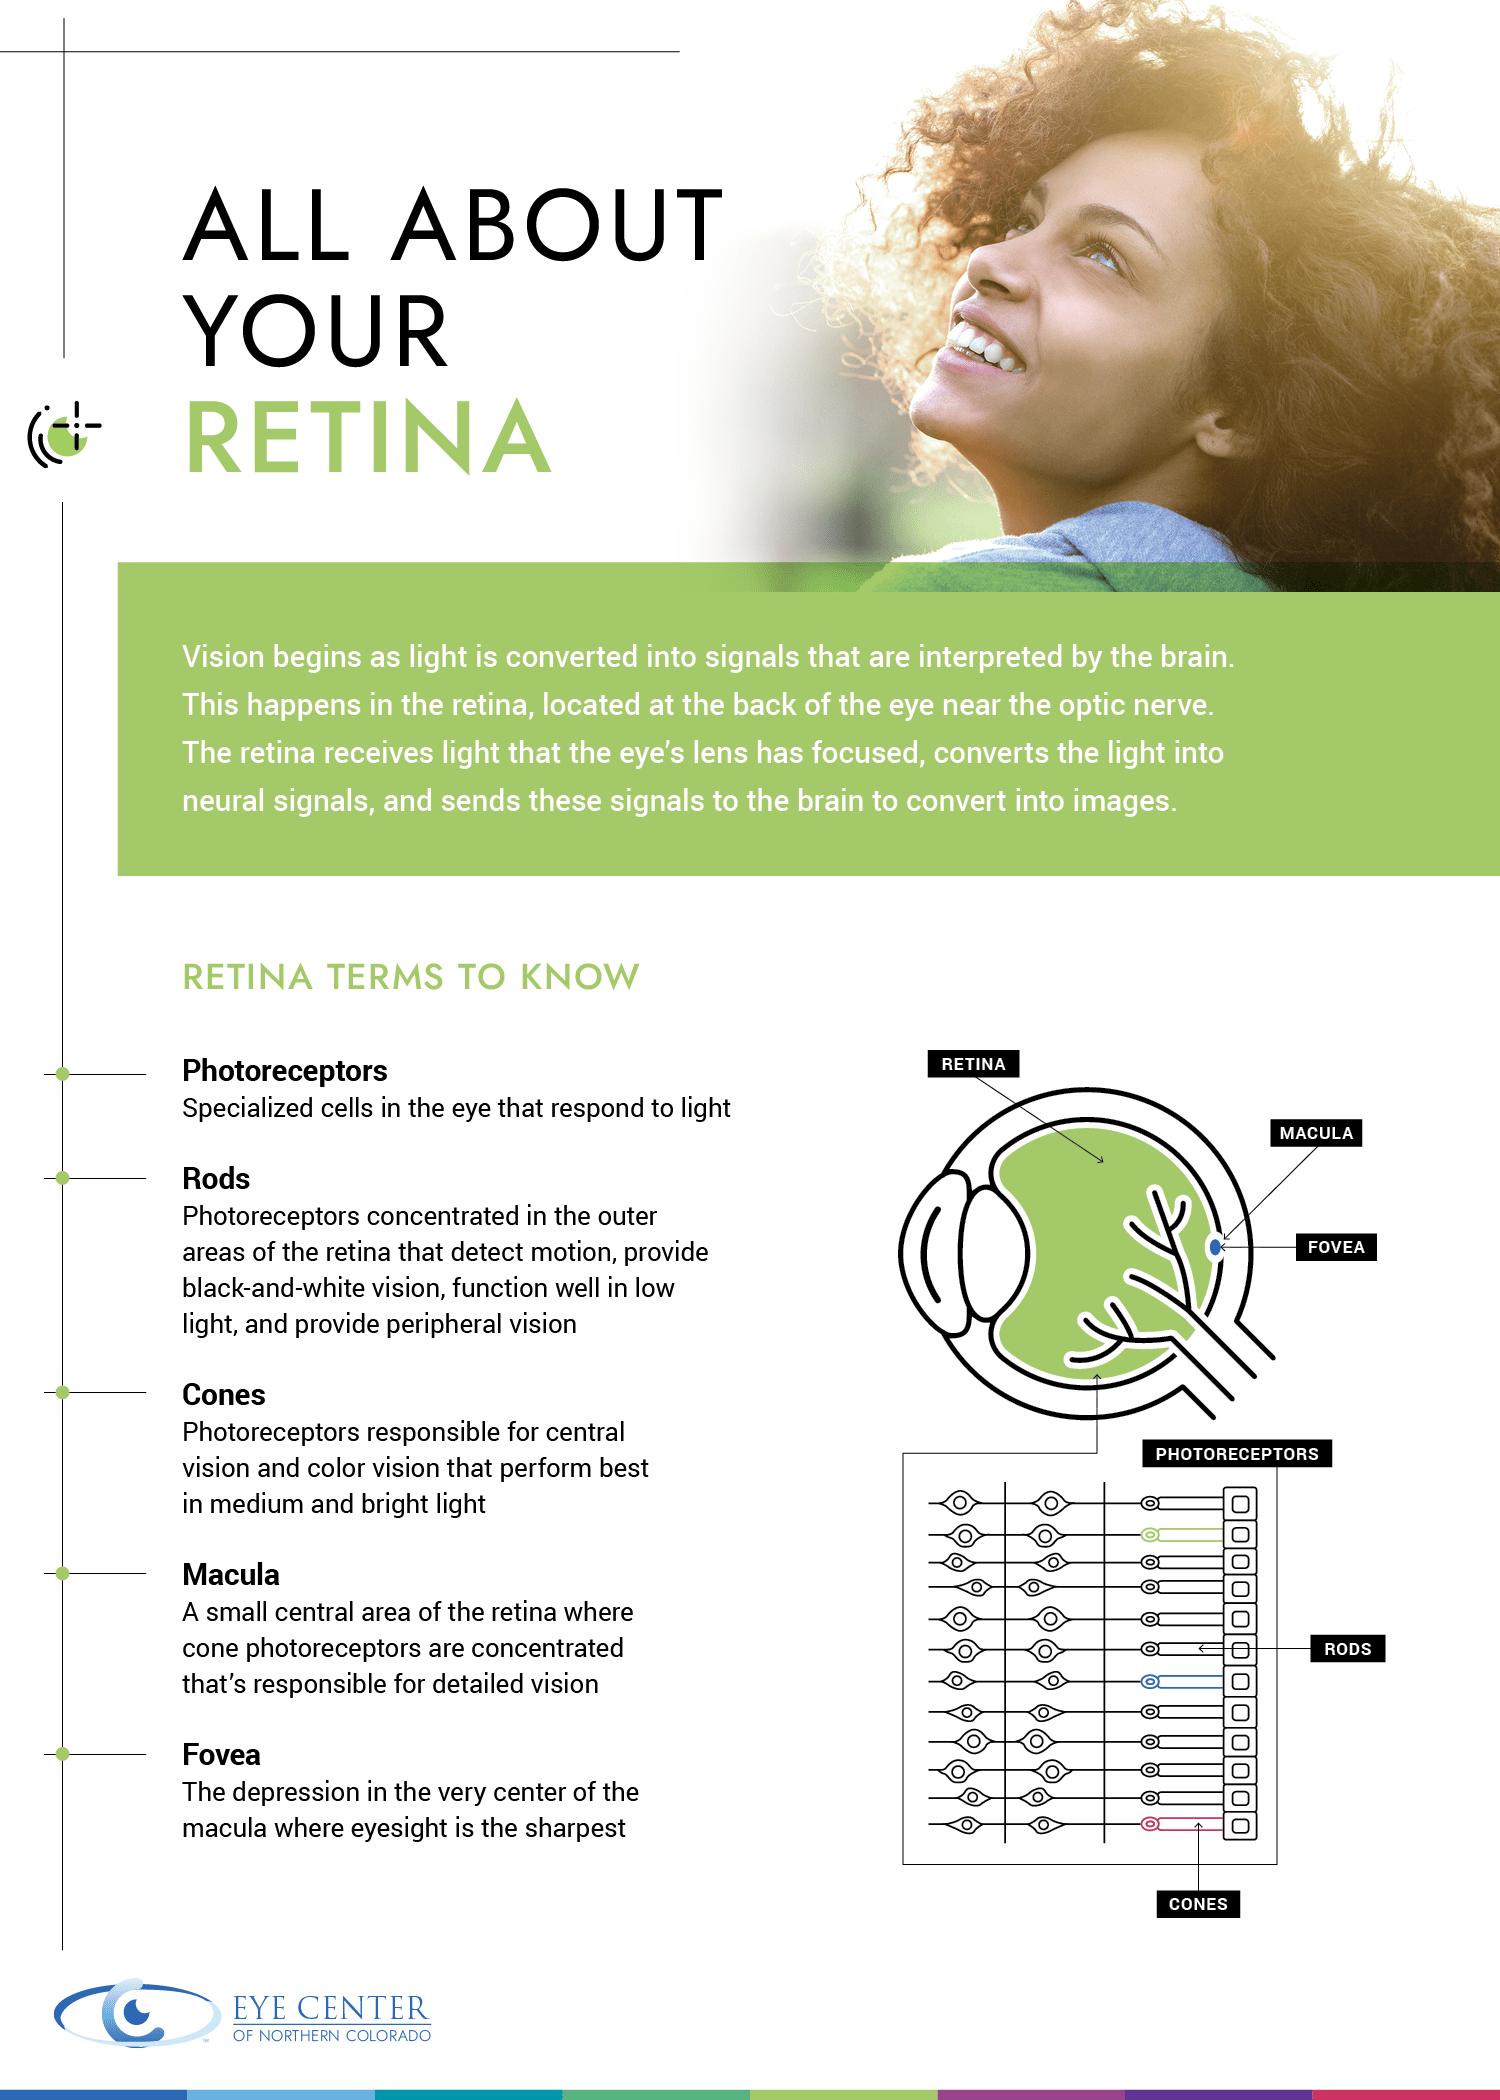 retina eye health infographic